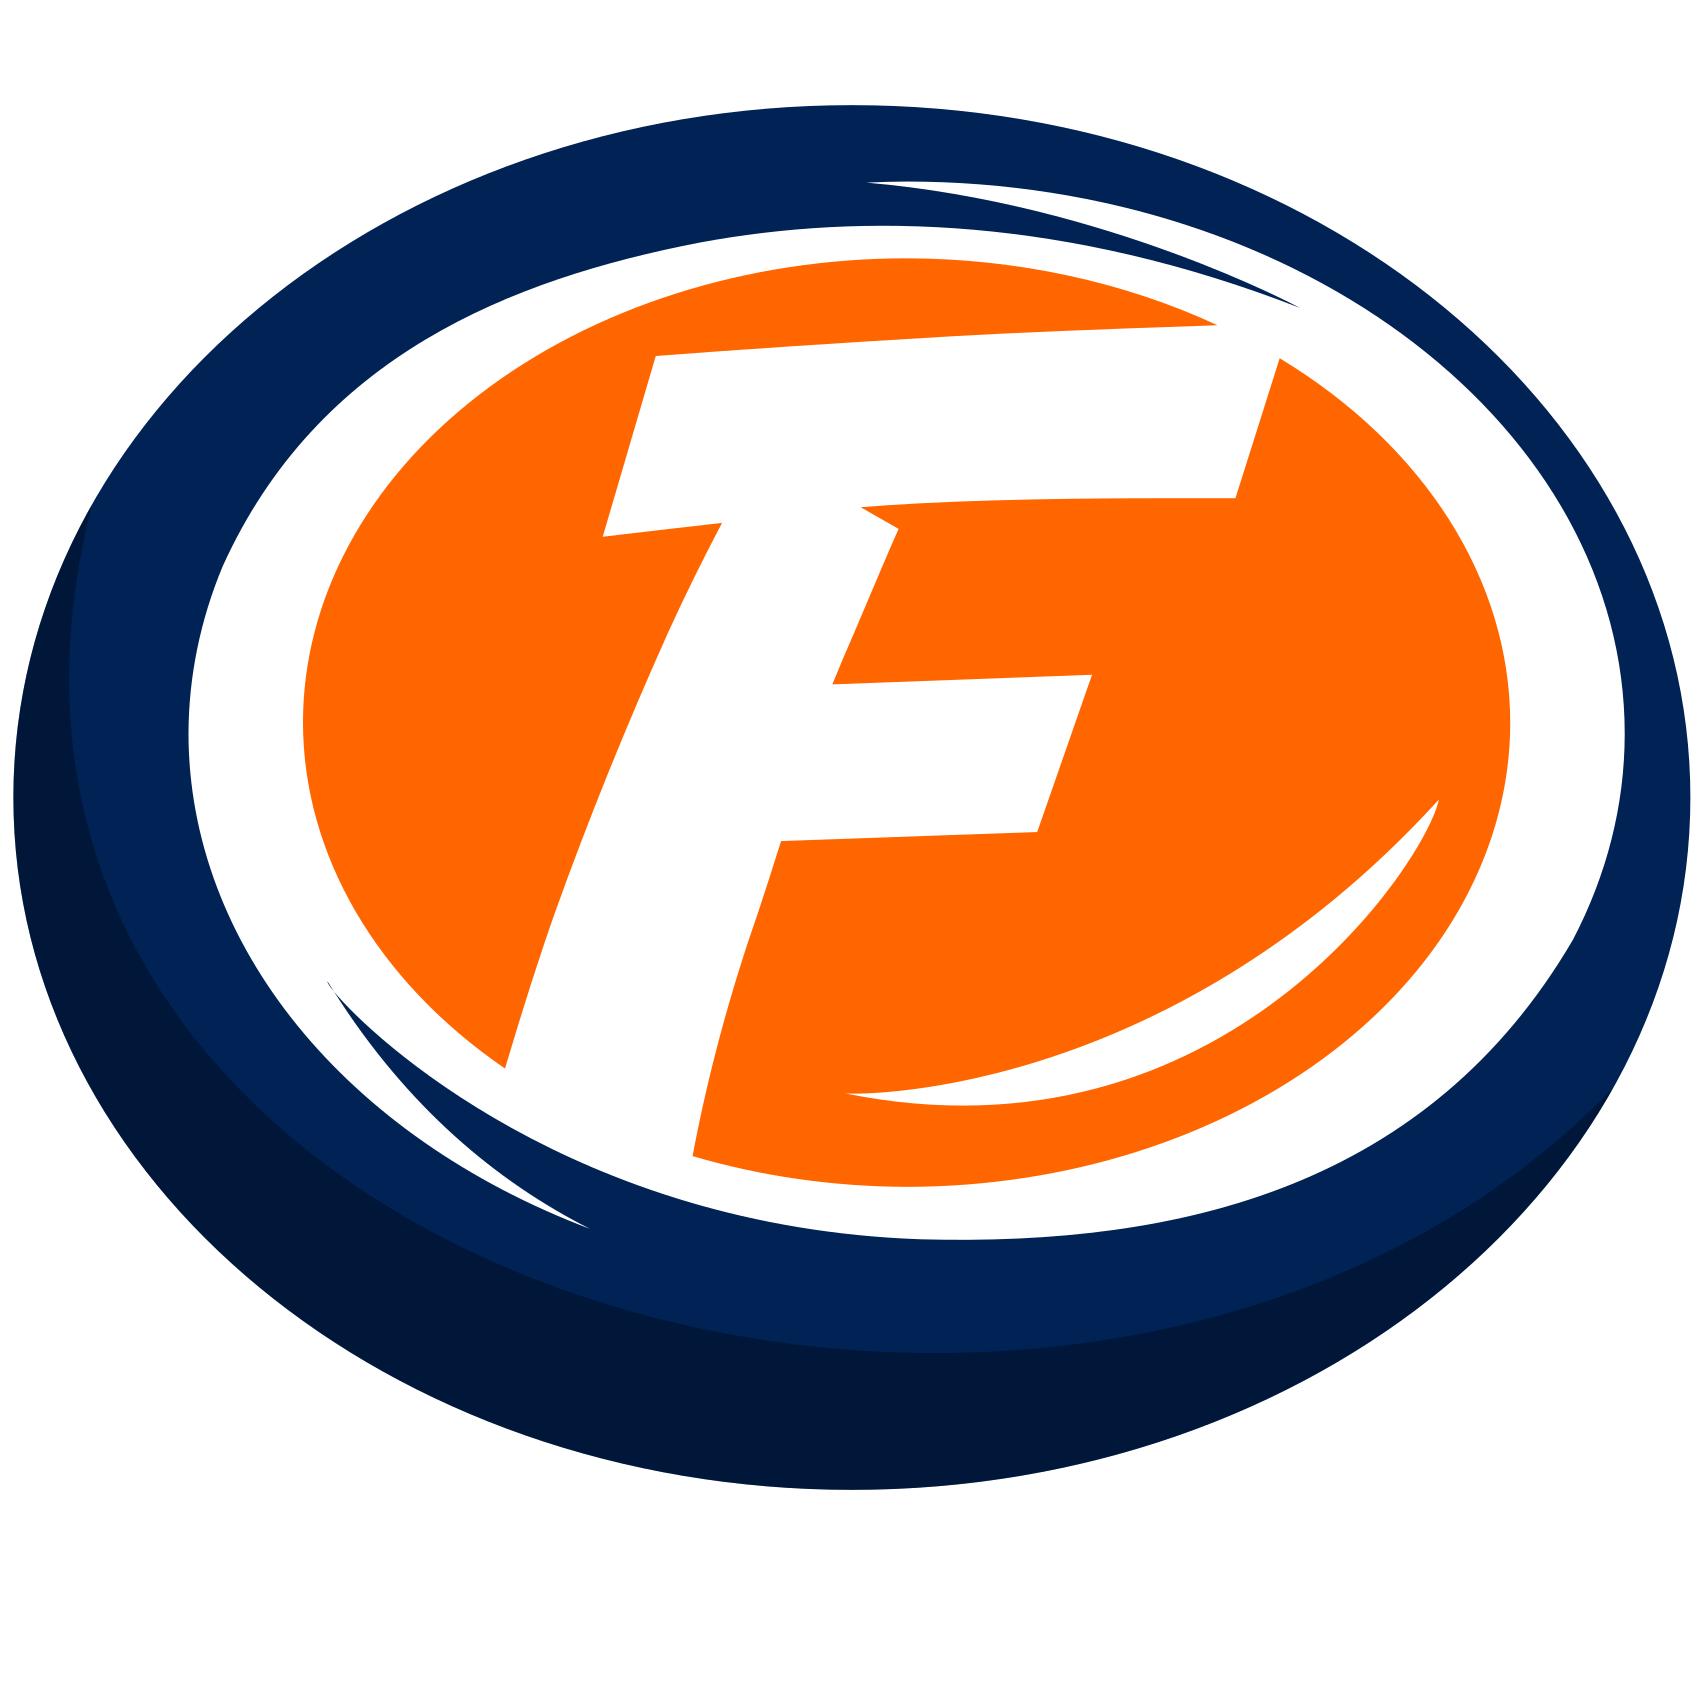 Postfix Docker Container - I am Frisbee